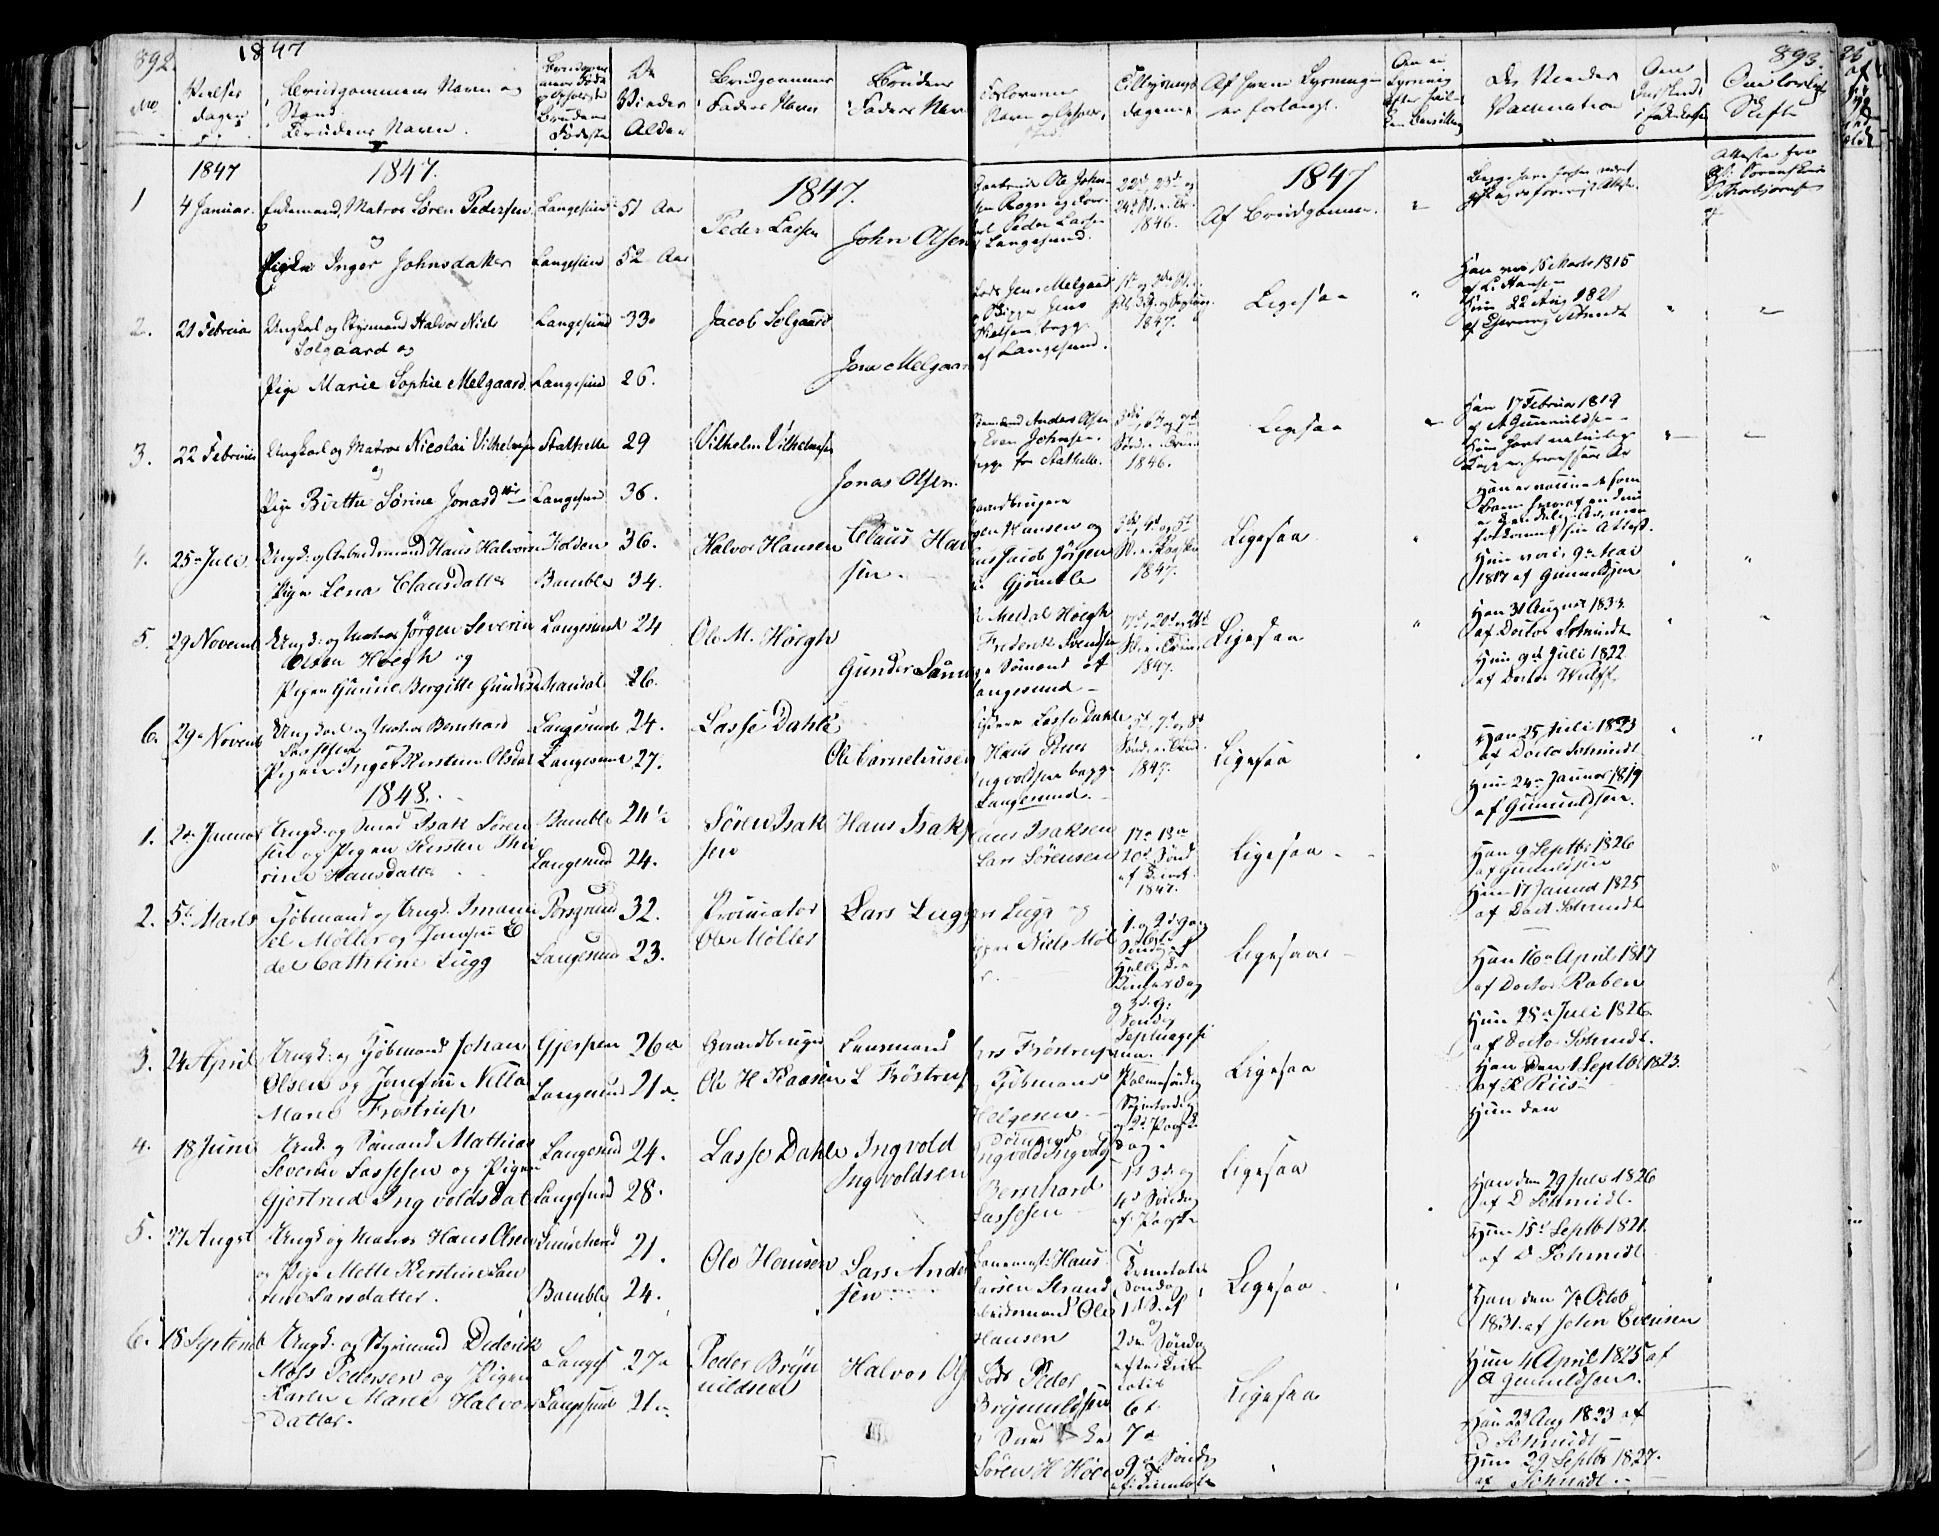 SAKO, Bamble kirkebøker, F/Fa/L0004: Ministerialbok nr. I 4, 1834-1853, s. 892-893